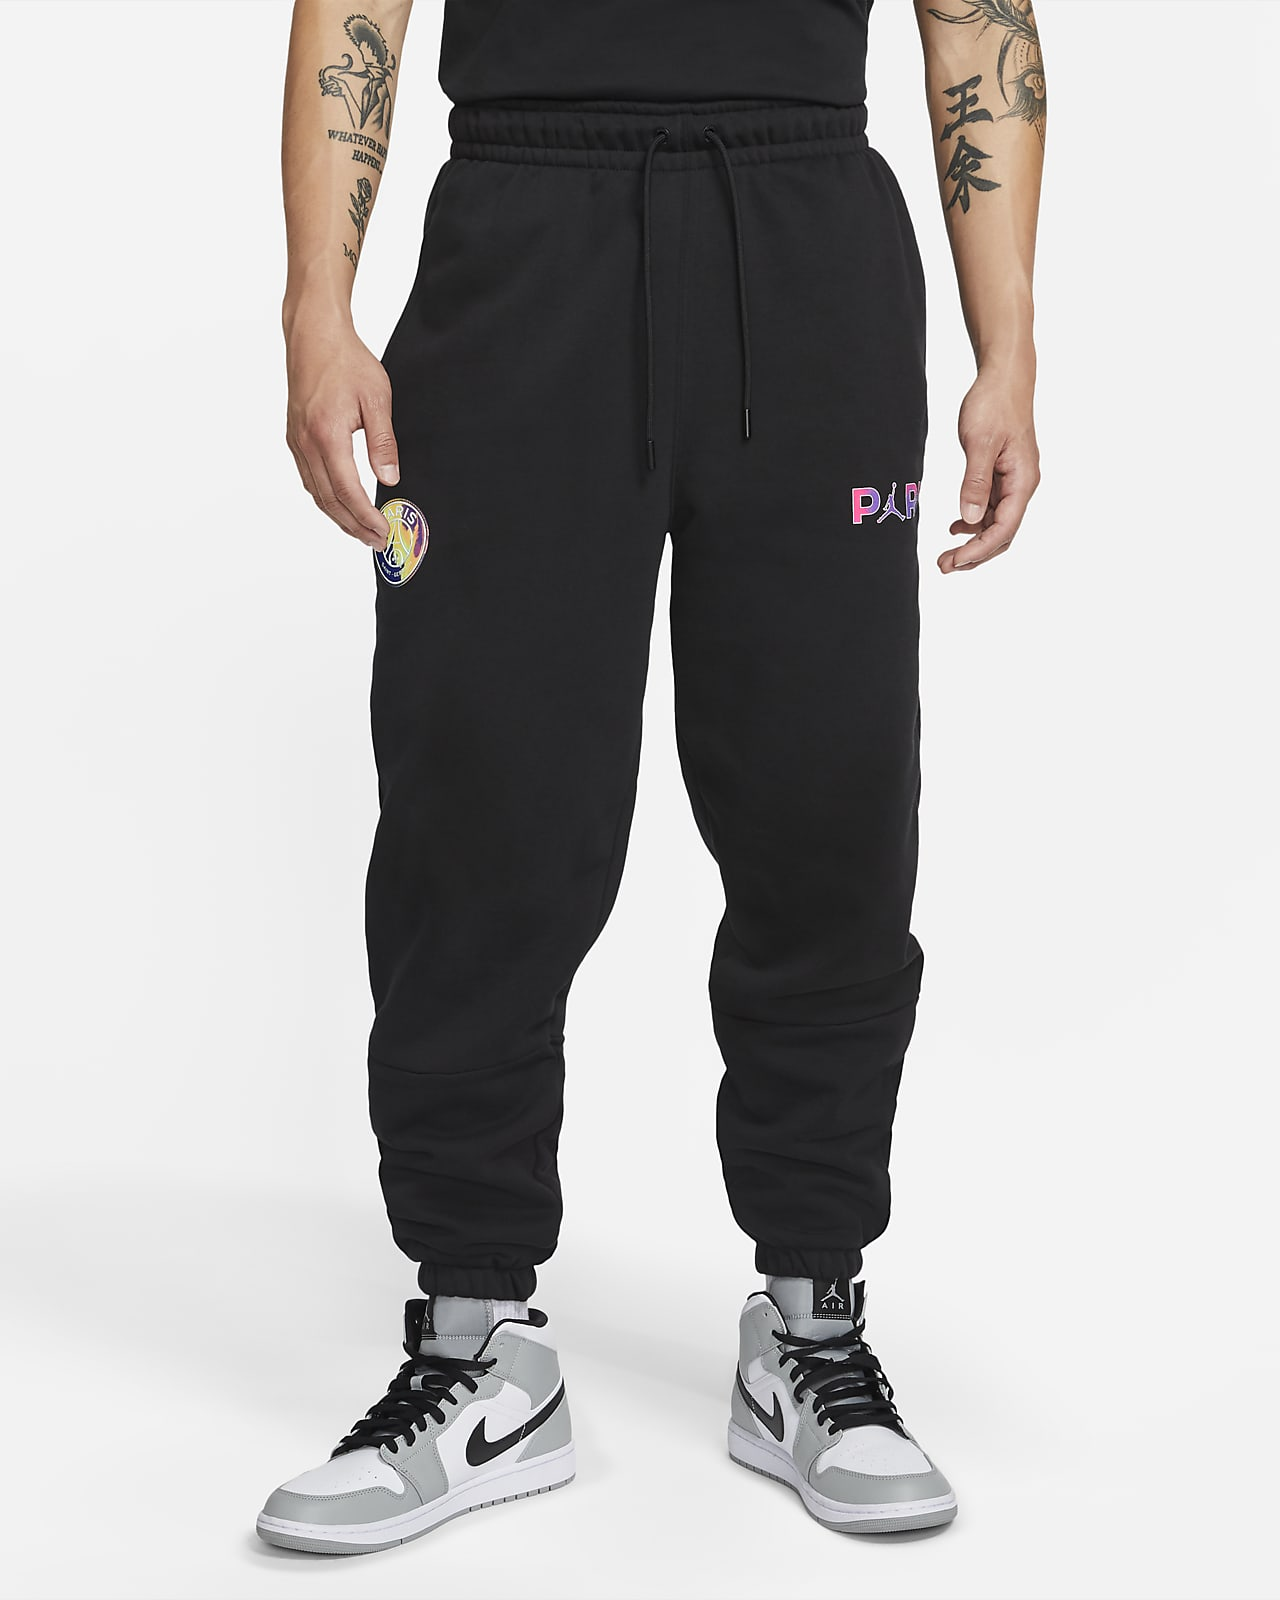 Pantaloni in fleece Paris Saint-Germain - Uomo